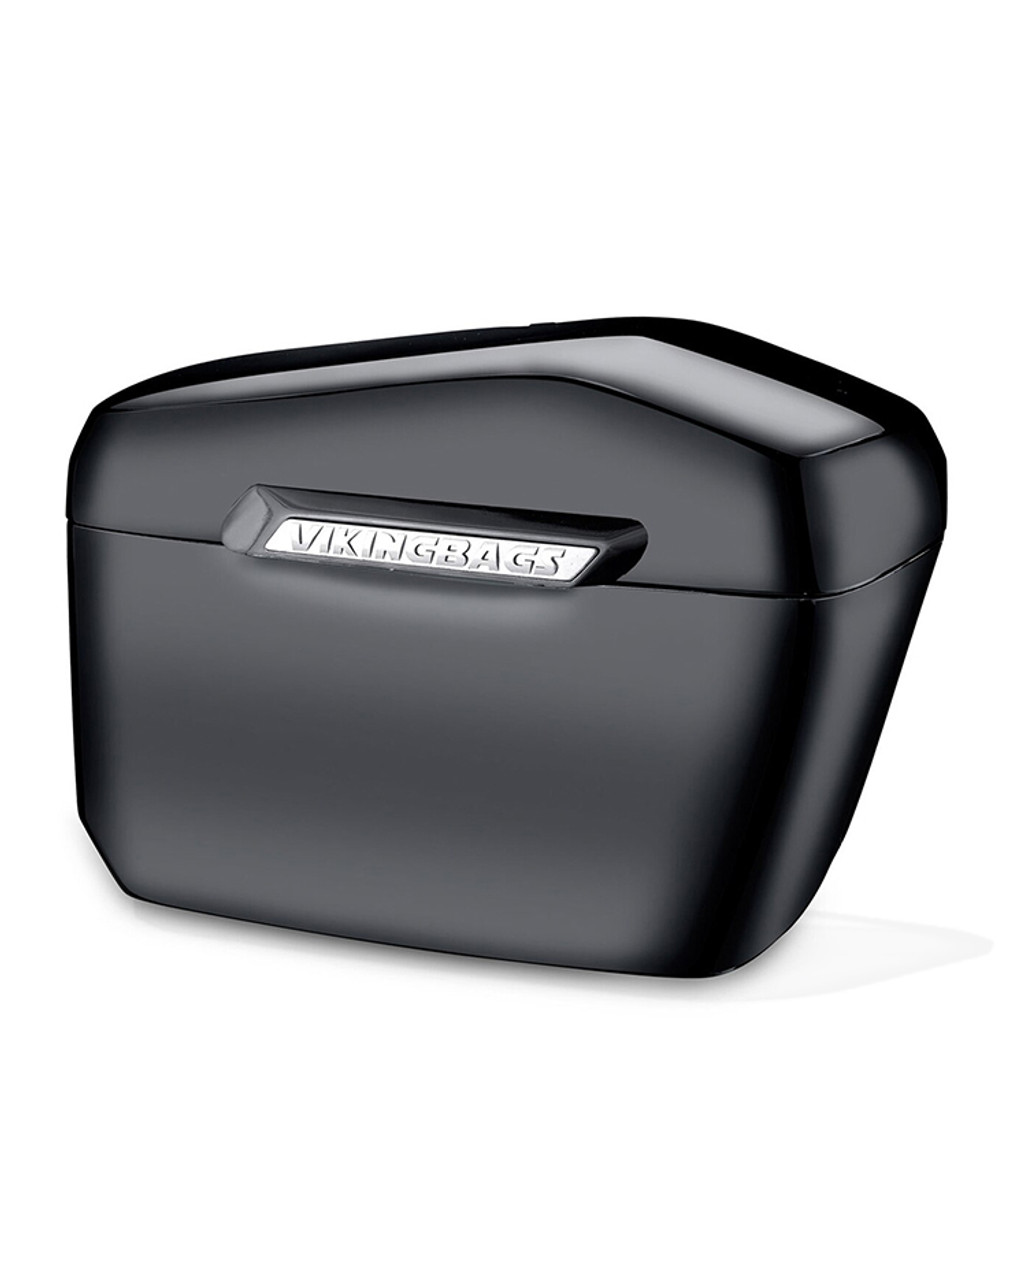 Honda VTX 1800 N Viking Lamellar Large Black Hard Saddlebags Main Bag View